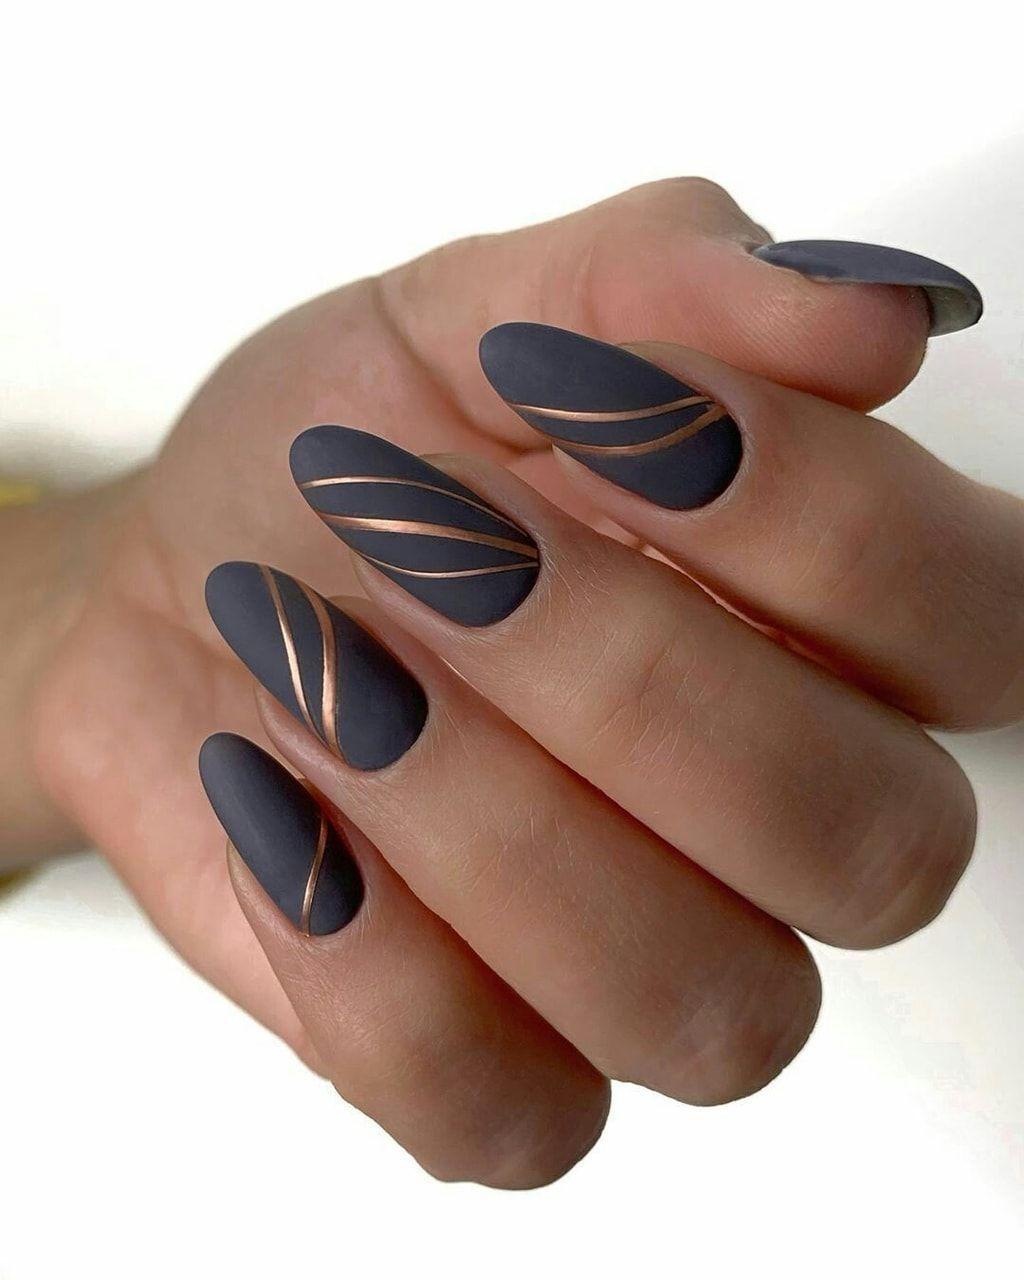 45 Classy Spring Nail Color Designs For Your Exceptional Style In 2020 Zelene Nehty Gelove Nehty Design Nehtu